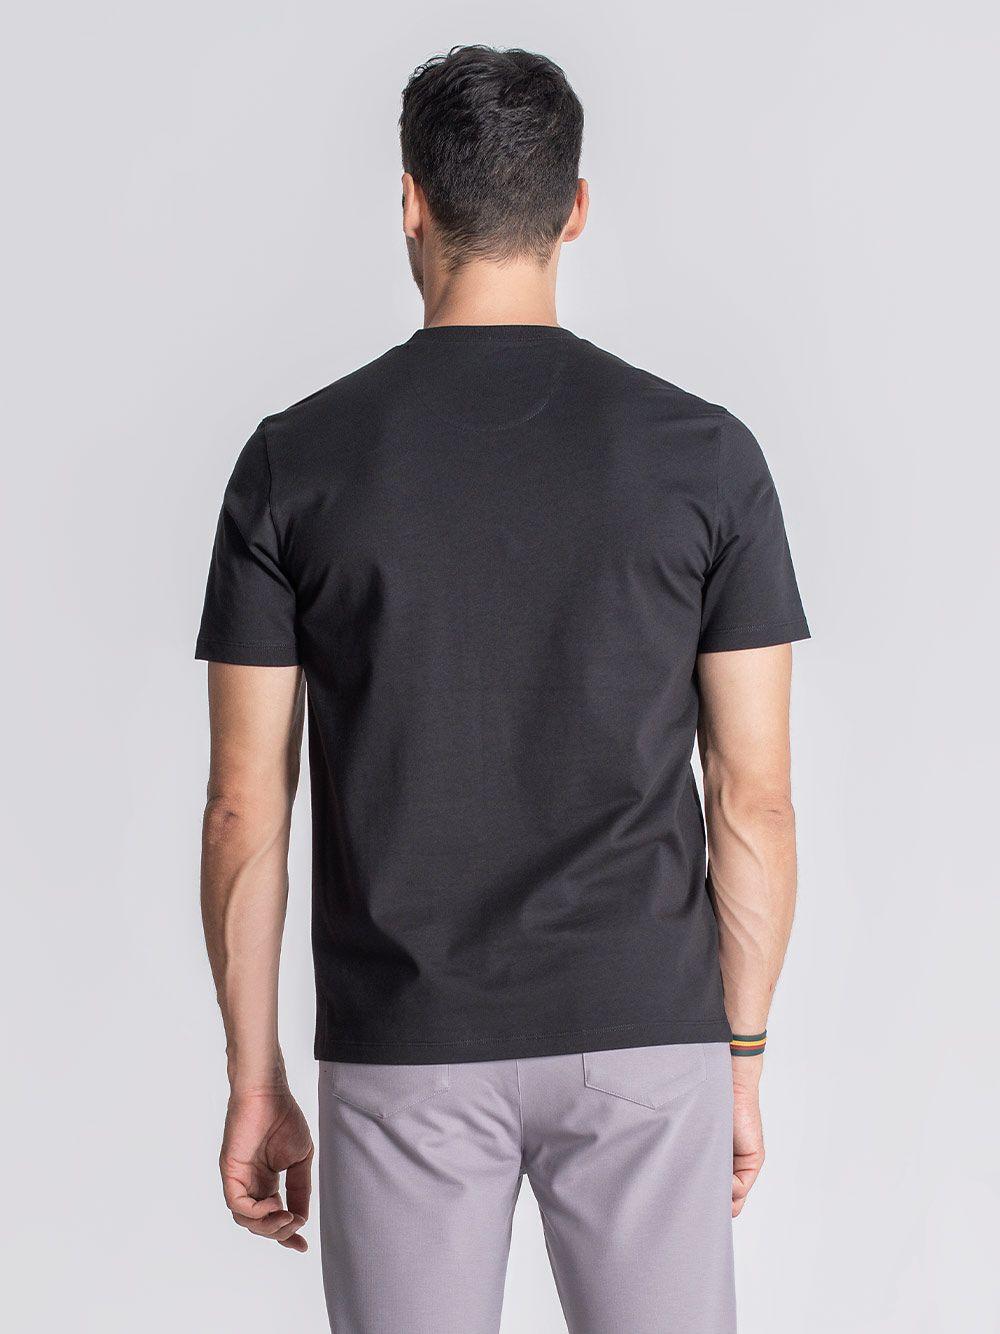 T-Shirt Clinton Preto  JEF